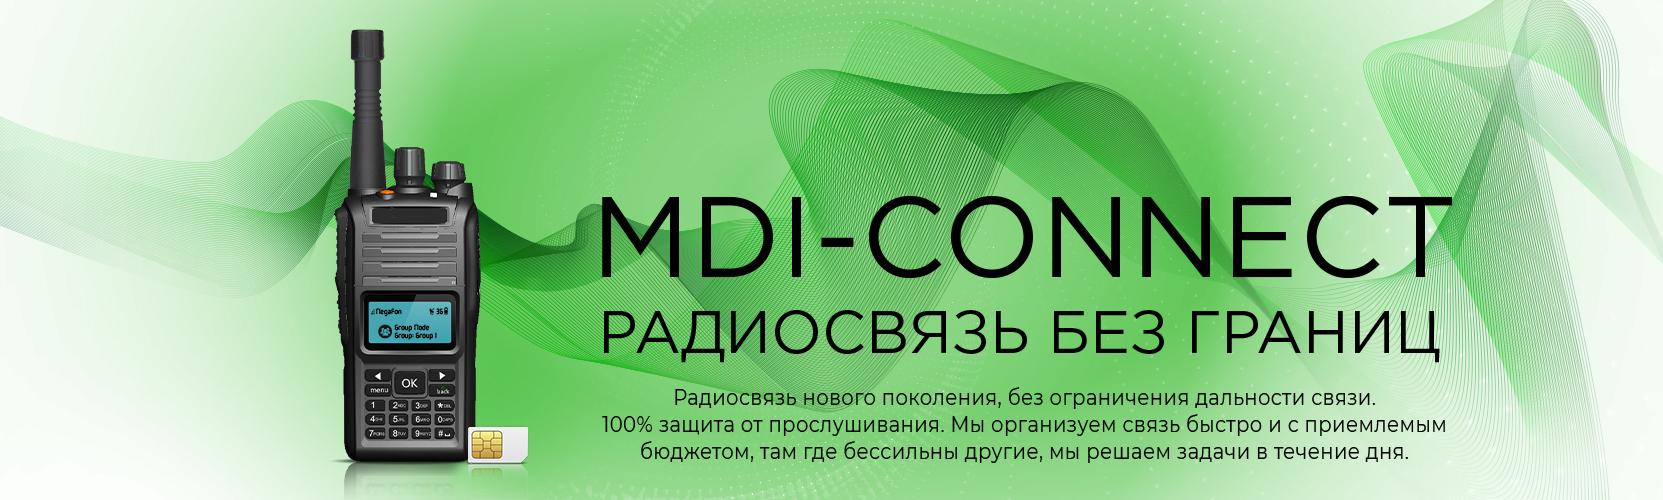 MDI-CONNECT - радиосвязь без границ